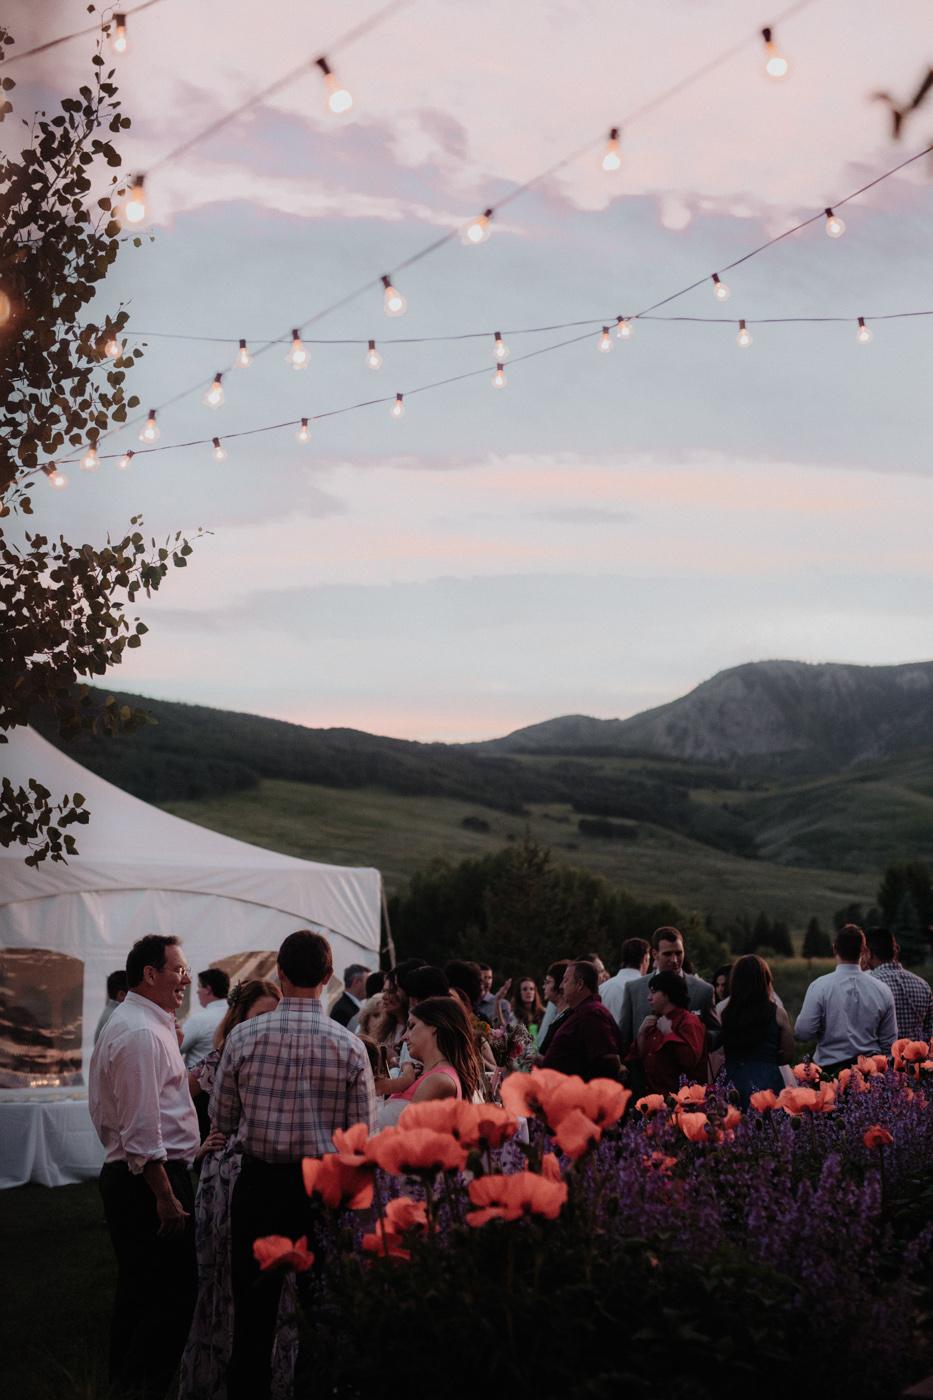 woods-walk-trail-crested-butte-colorado-wedding-144.jpg